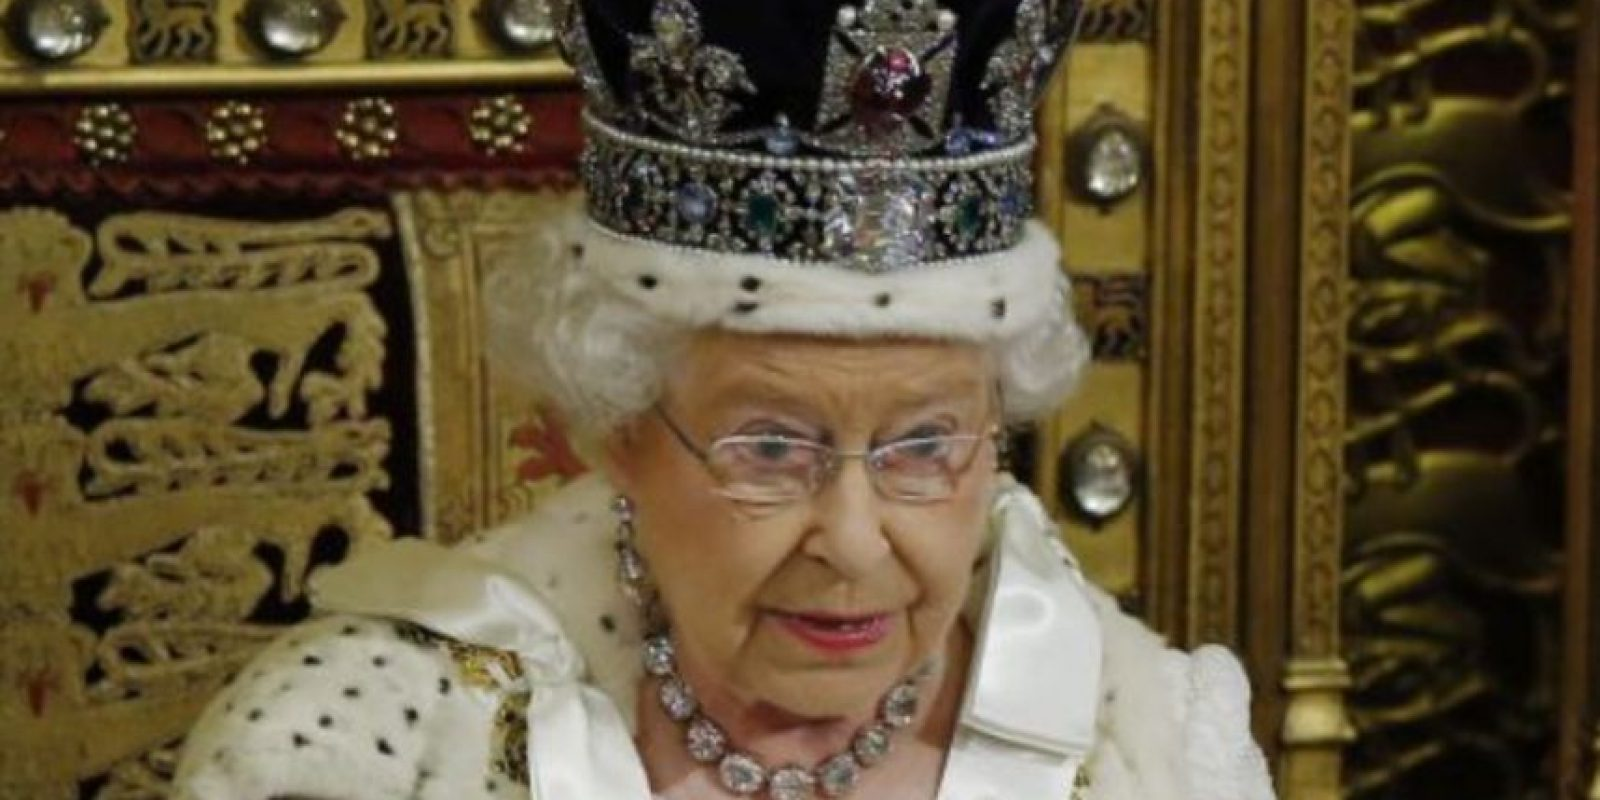 La Reina Elizabeth II de Inglaterra, quien gobierna desde 1952. Foto:Getty Images